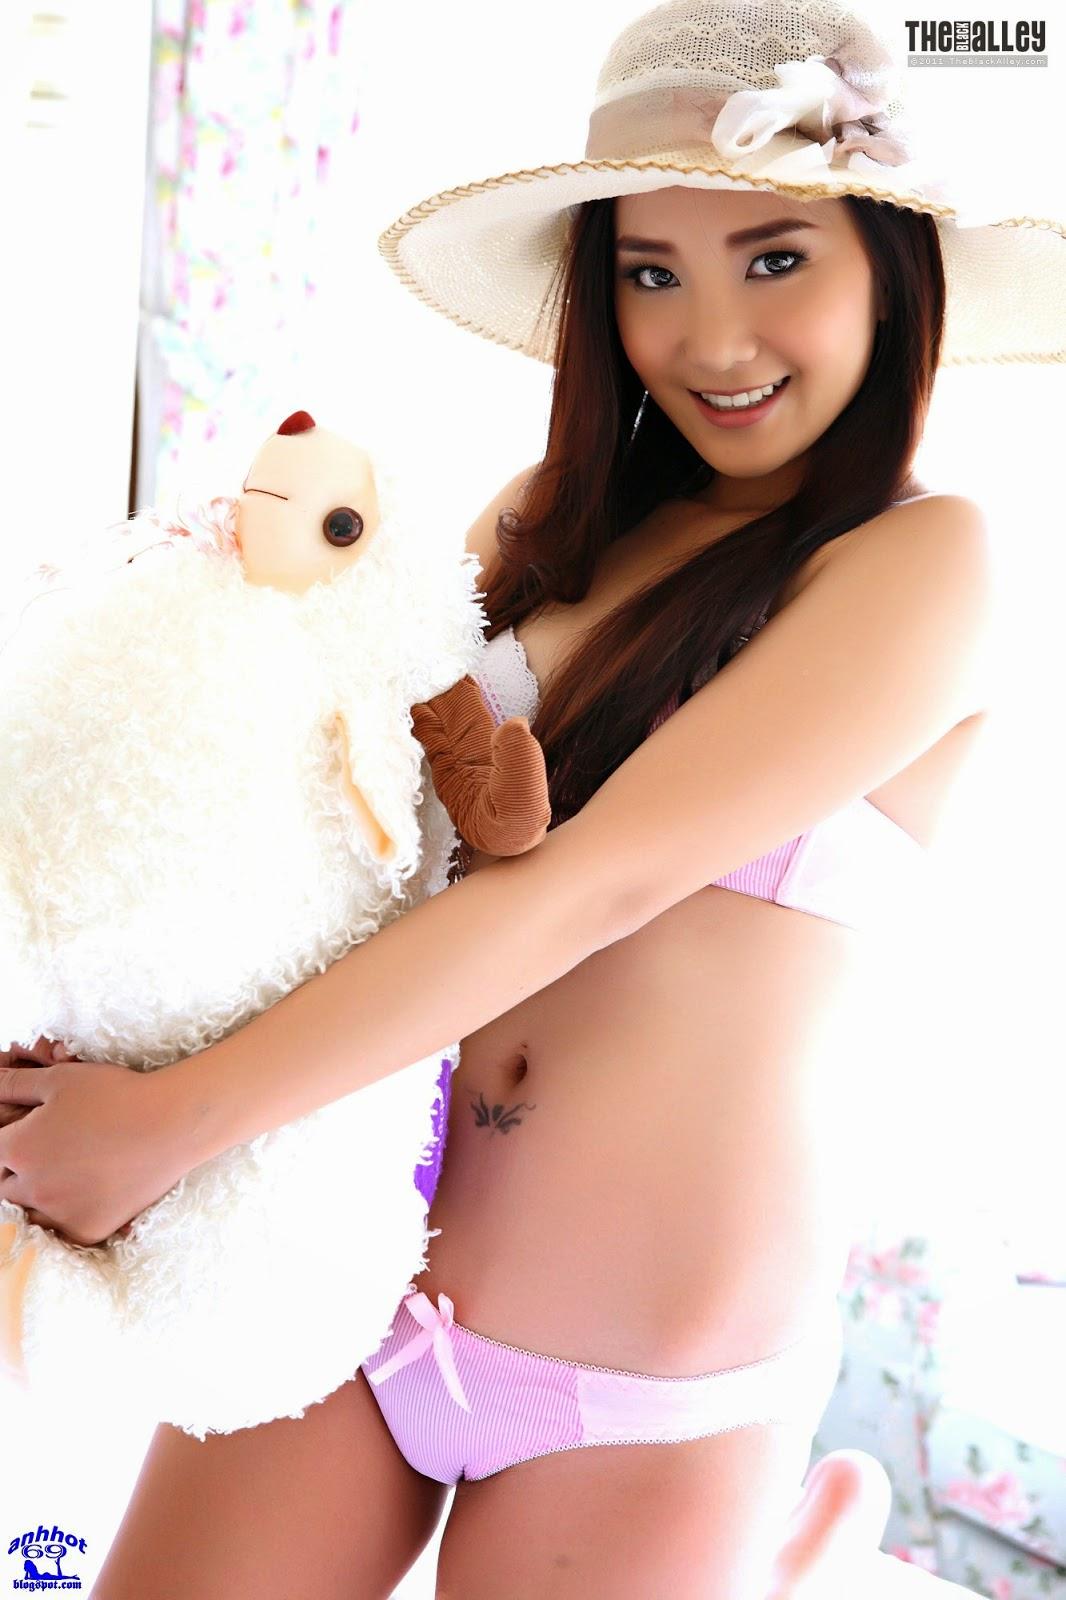 lolita-cheng-64-014